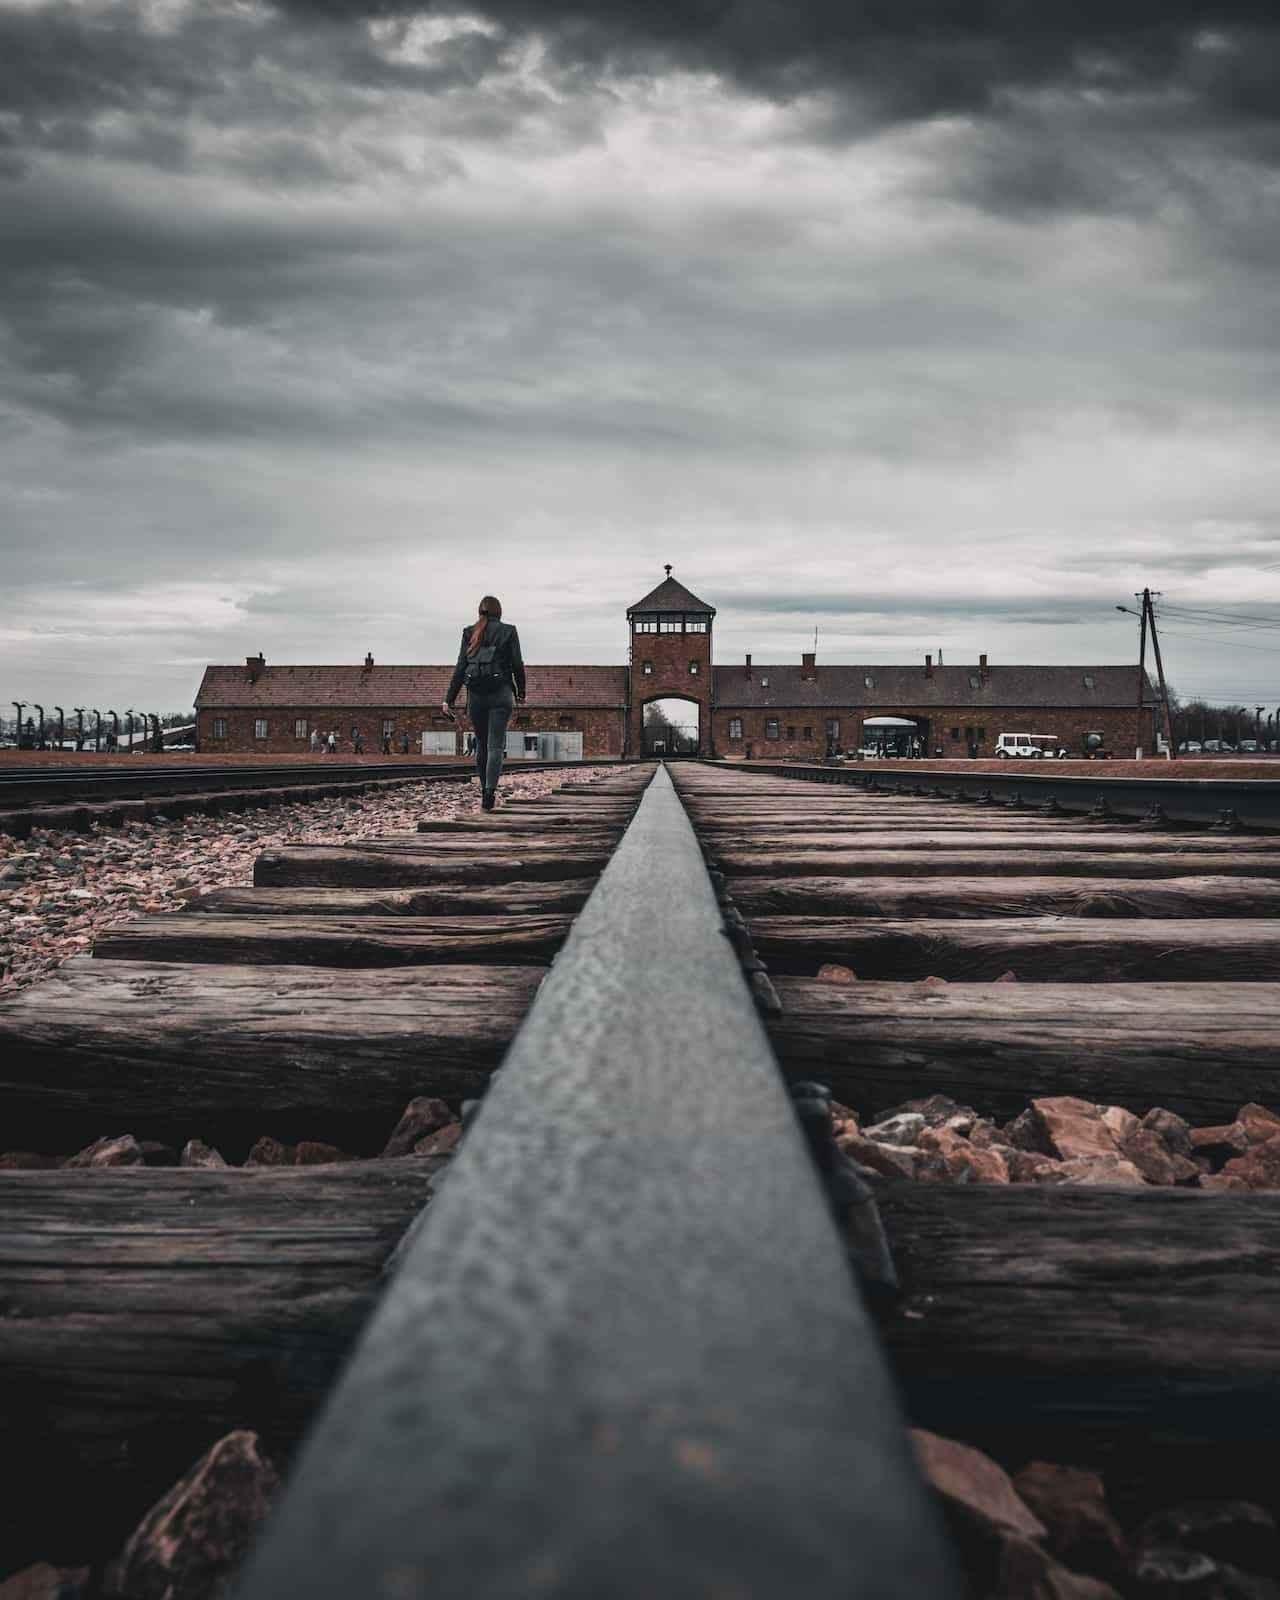 VERDUGOS DE NAZIS | SILDAVIA T01xE28 | https://www.luisbermejo.com